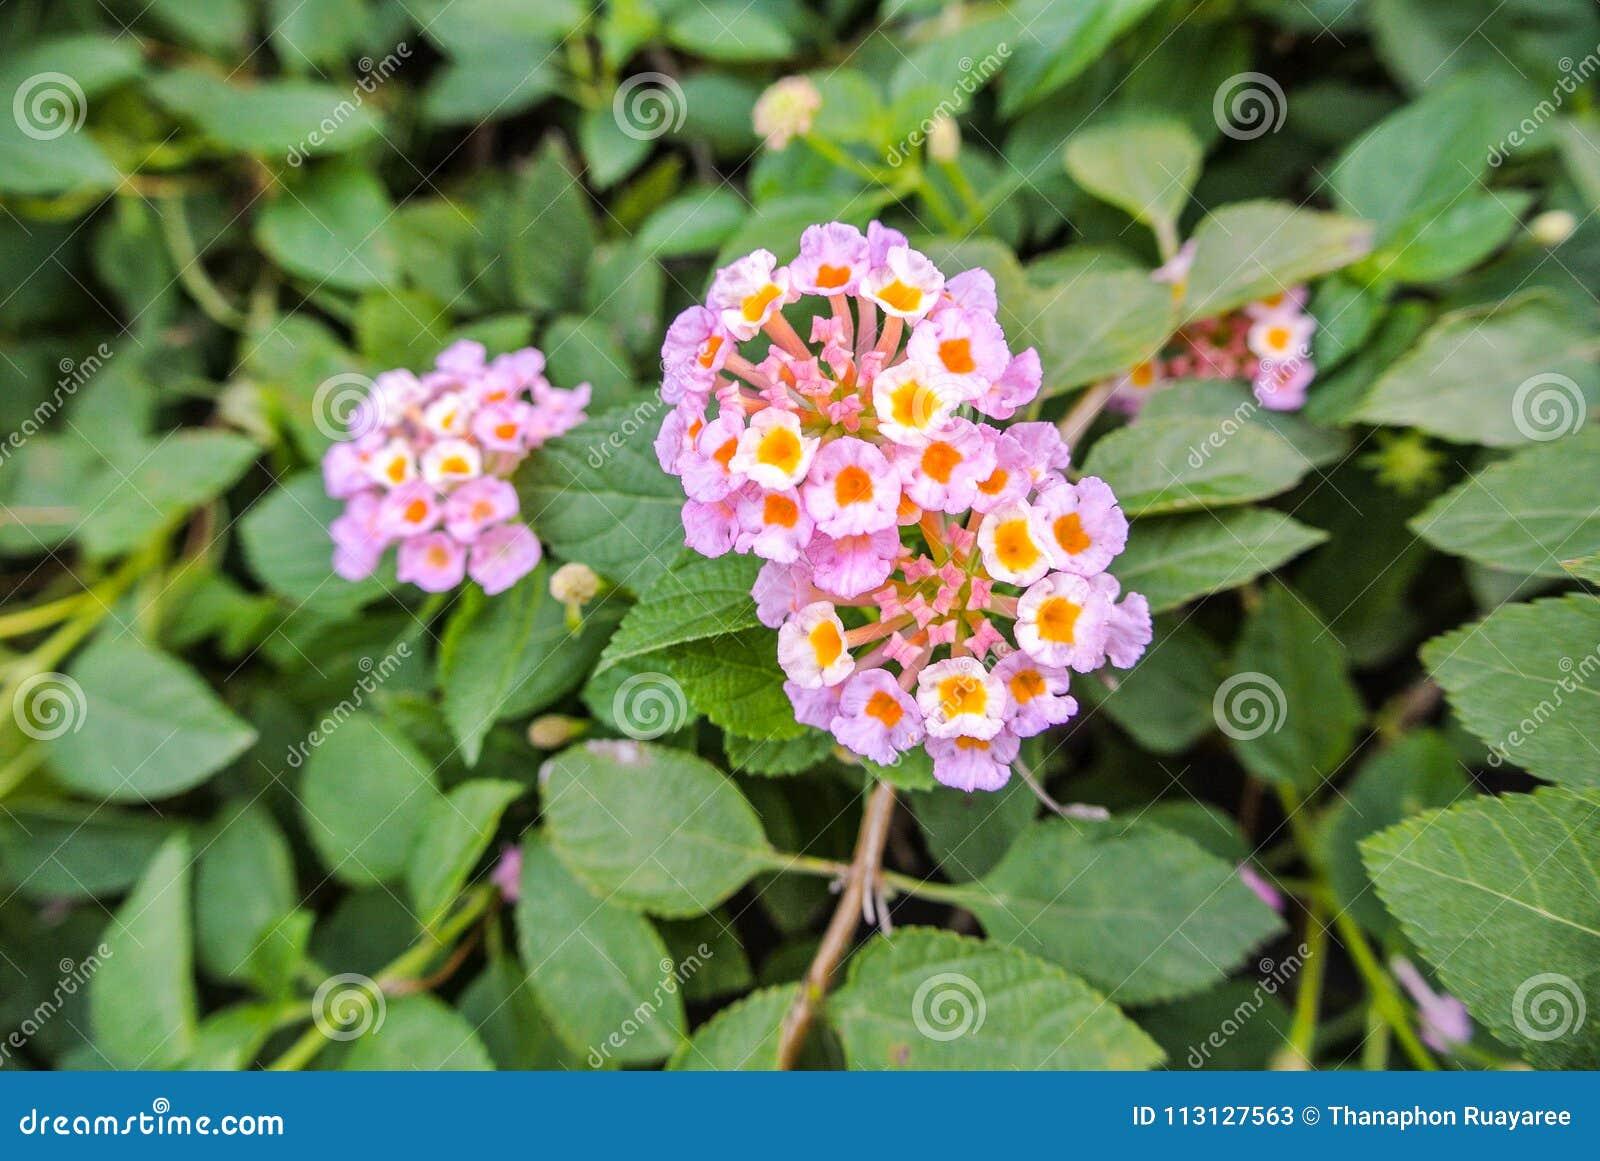 Lantana Camara A Species Of Flowering Plant Stock Image Image Of